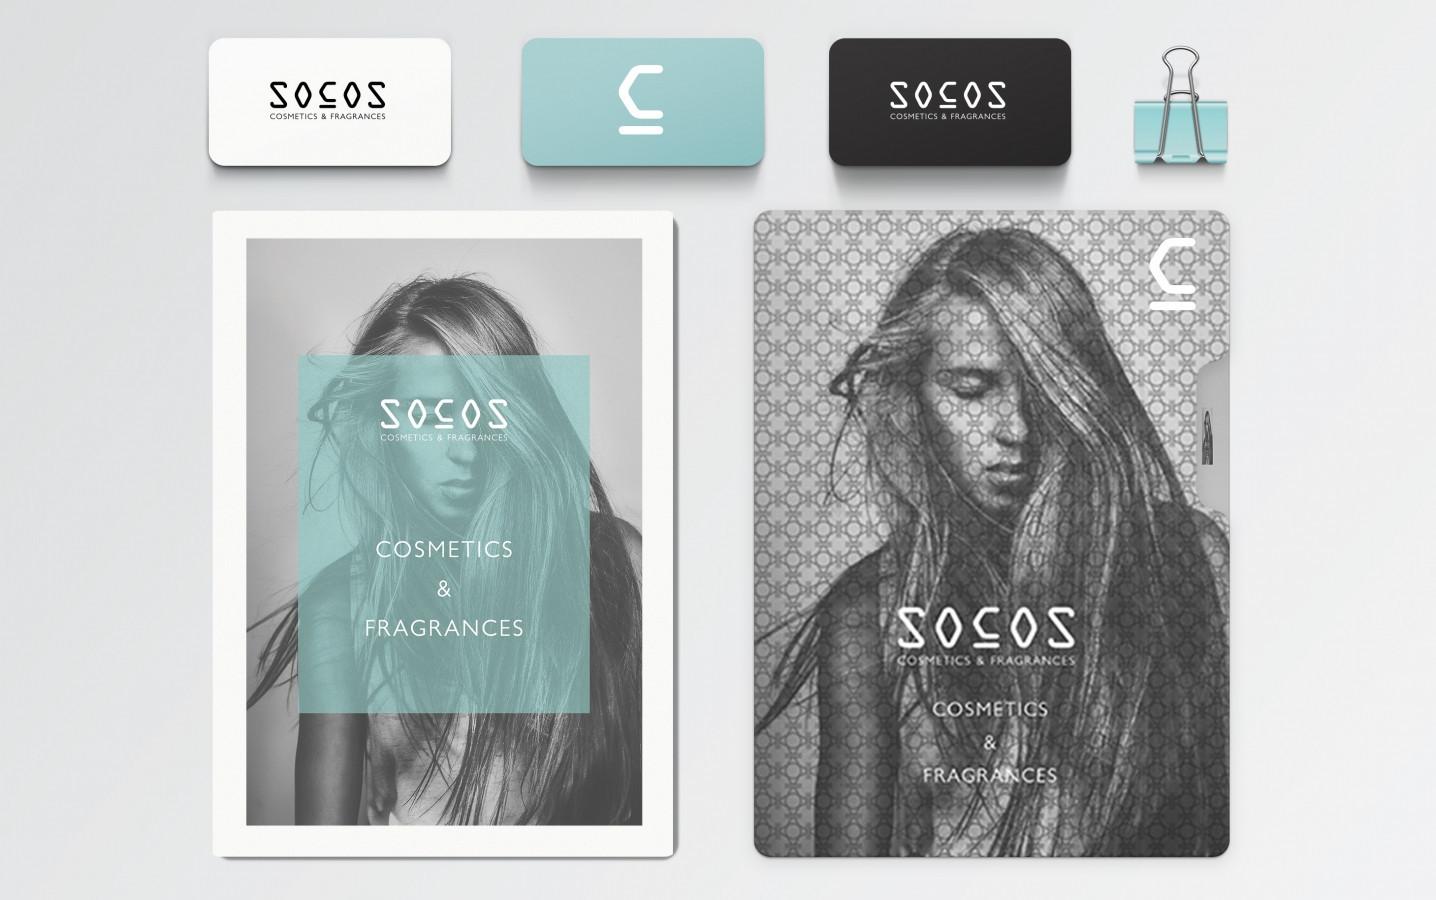 SOCOS (SOVOS grupės dalis/Cosmetics & Fragrances) firminis stilius  Photographer: Greta Bernotaitė Model: Indrė Kausylaitė